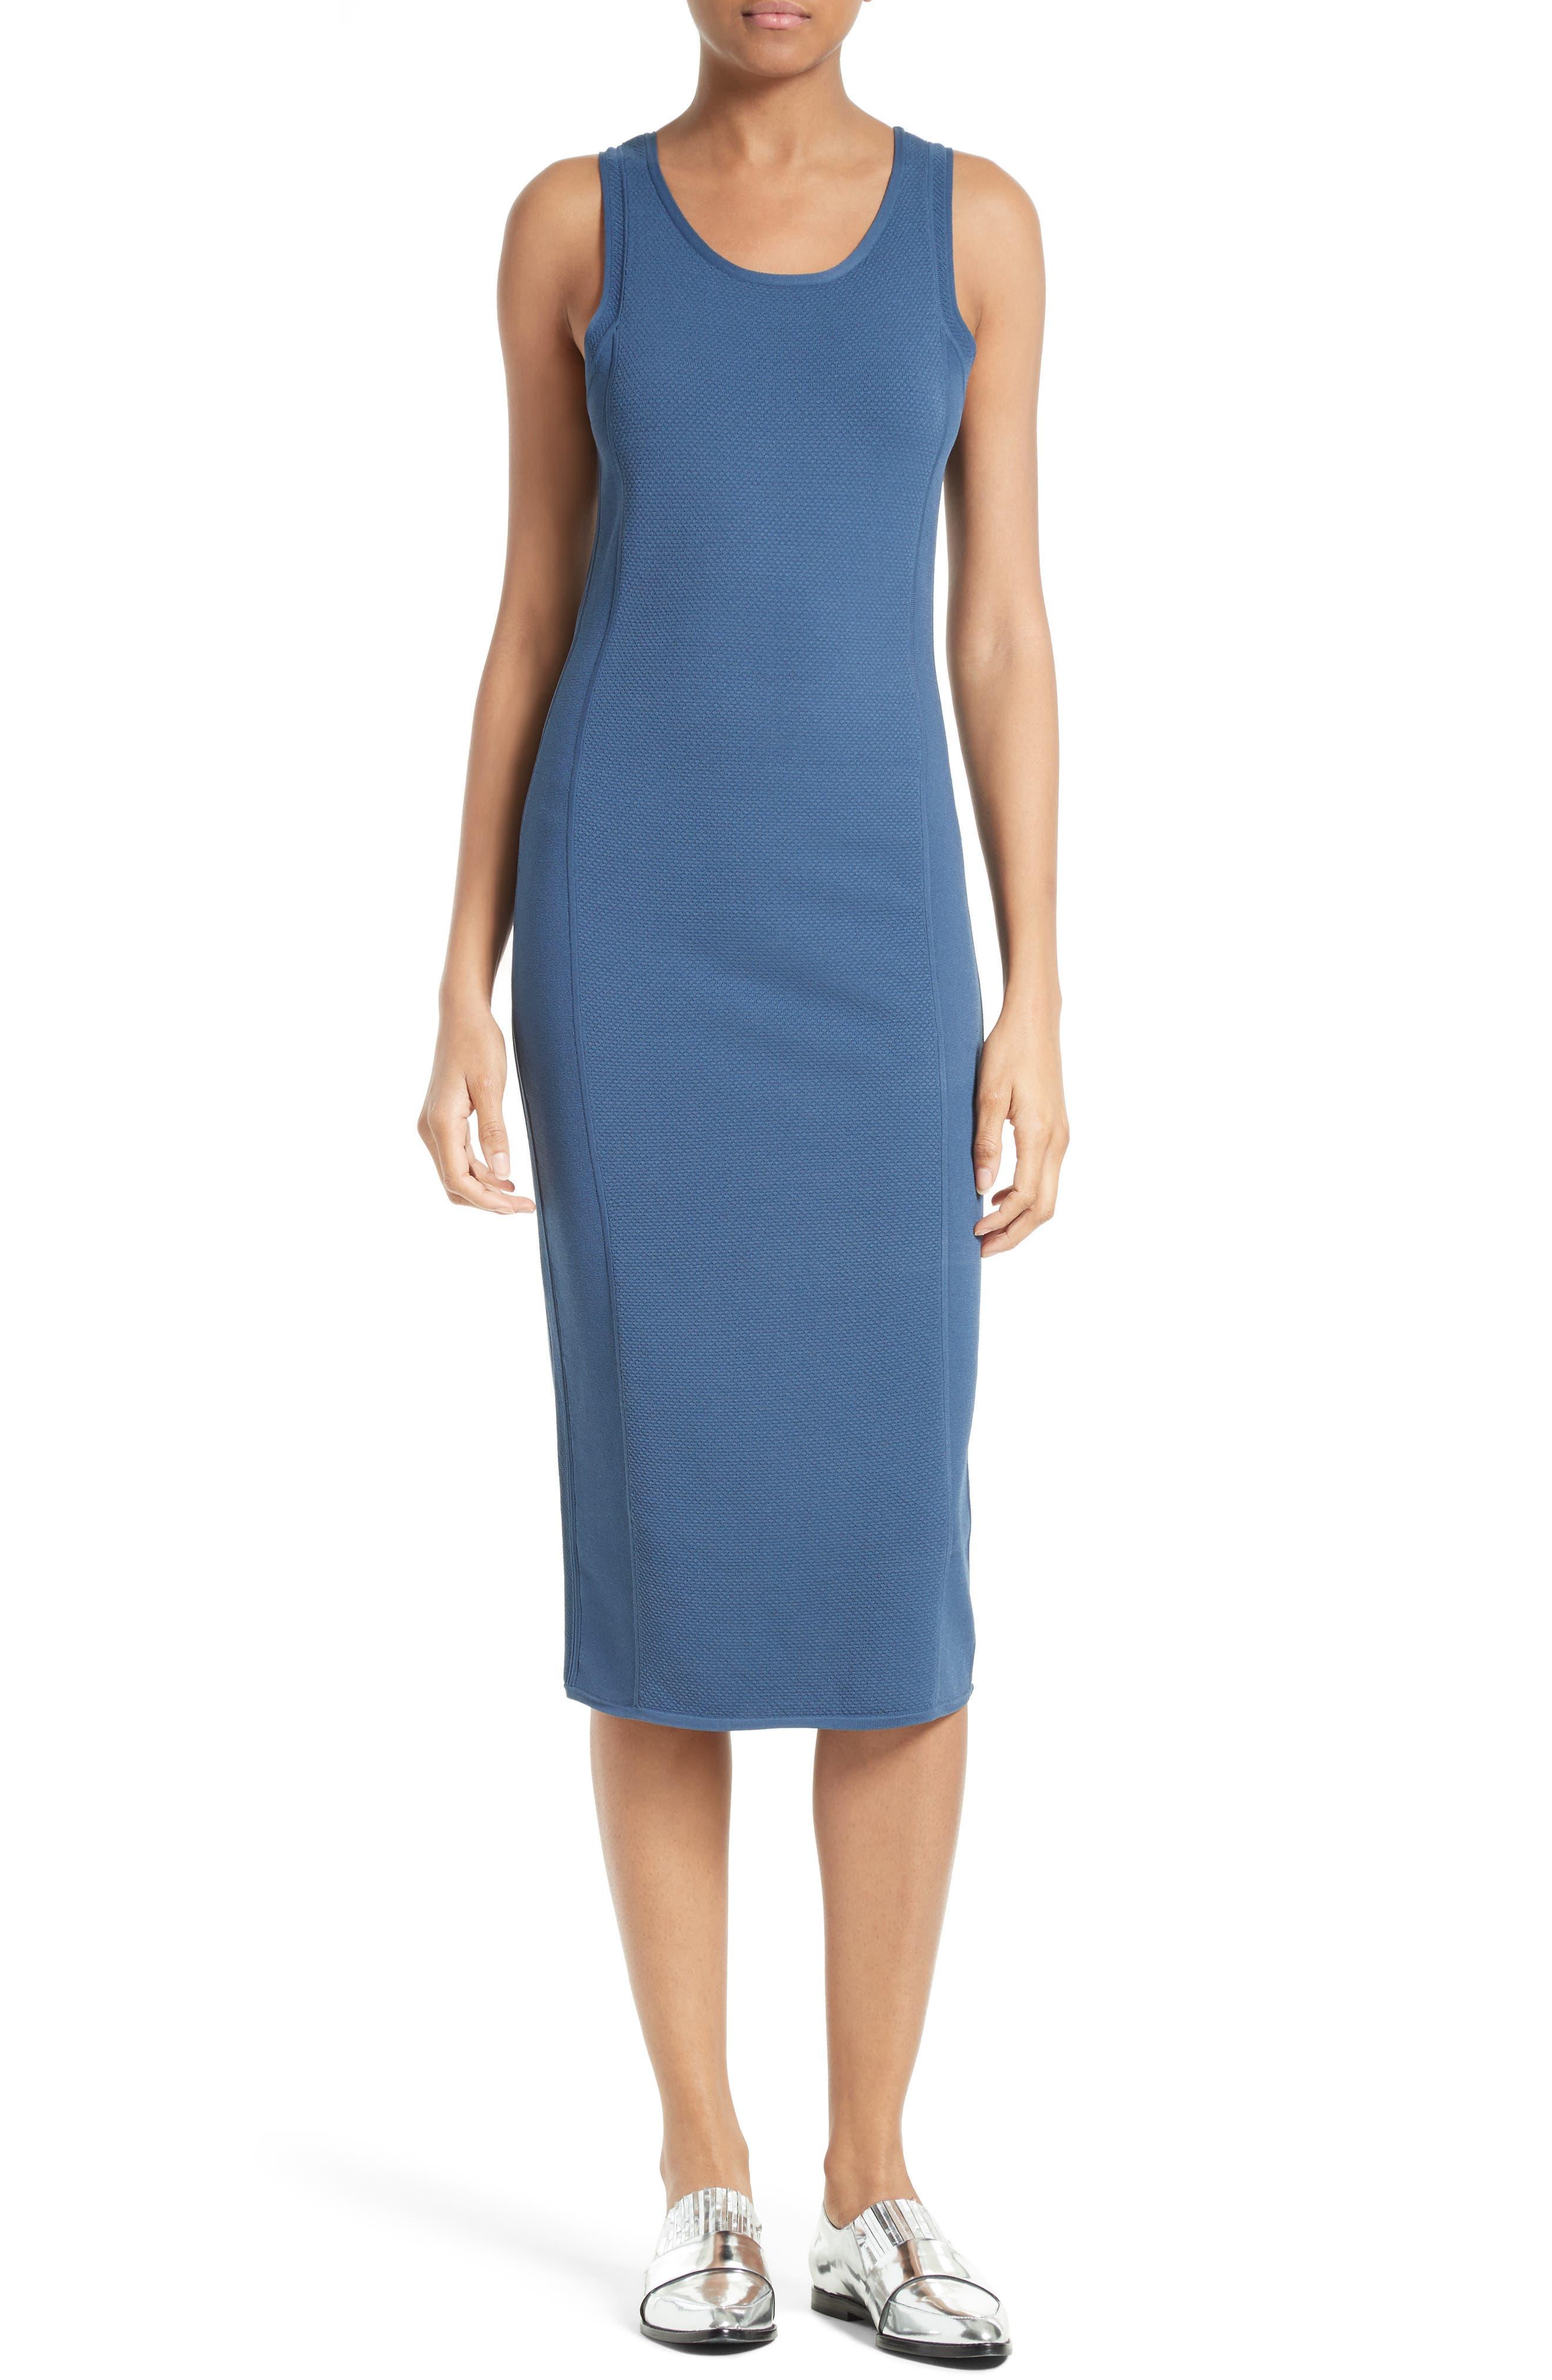 Alternate Image 1 Selected - Diane von Furstenberg Knit Tank Dress